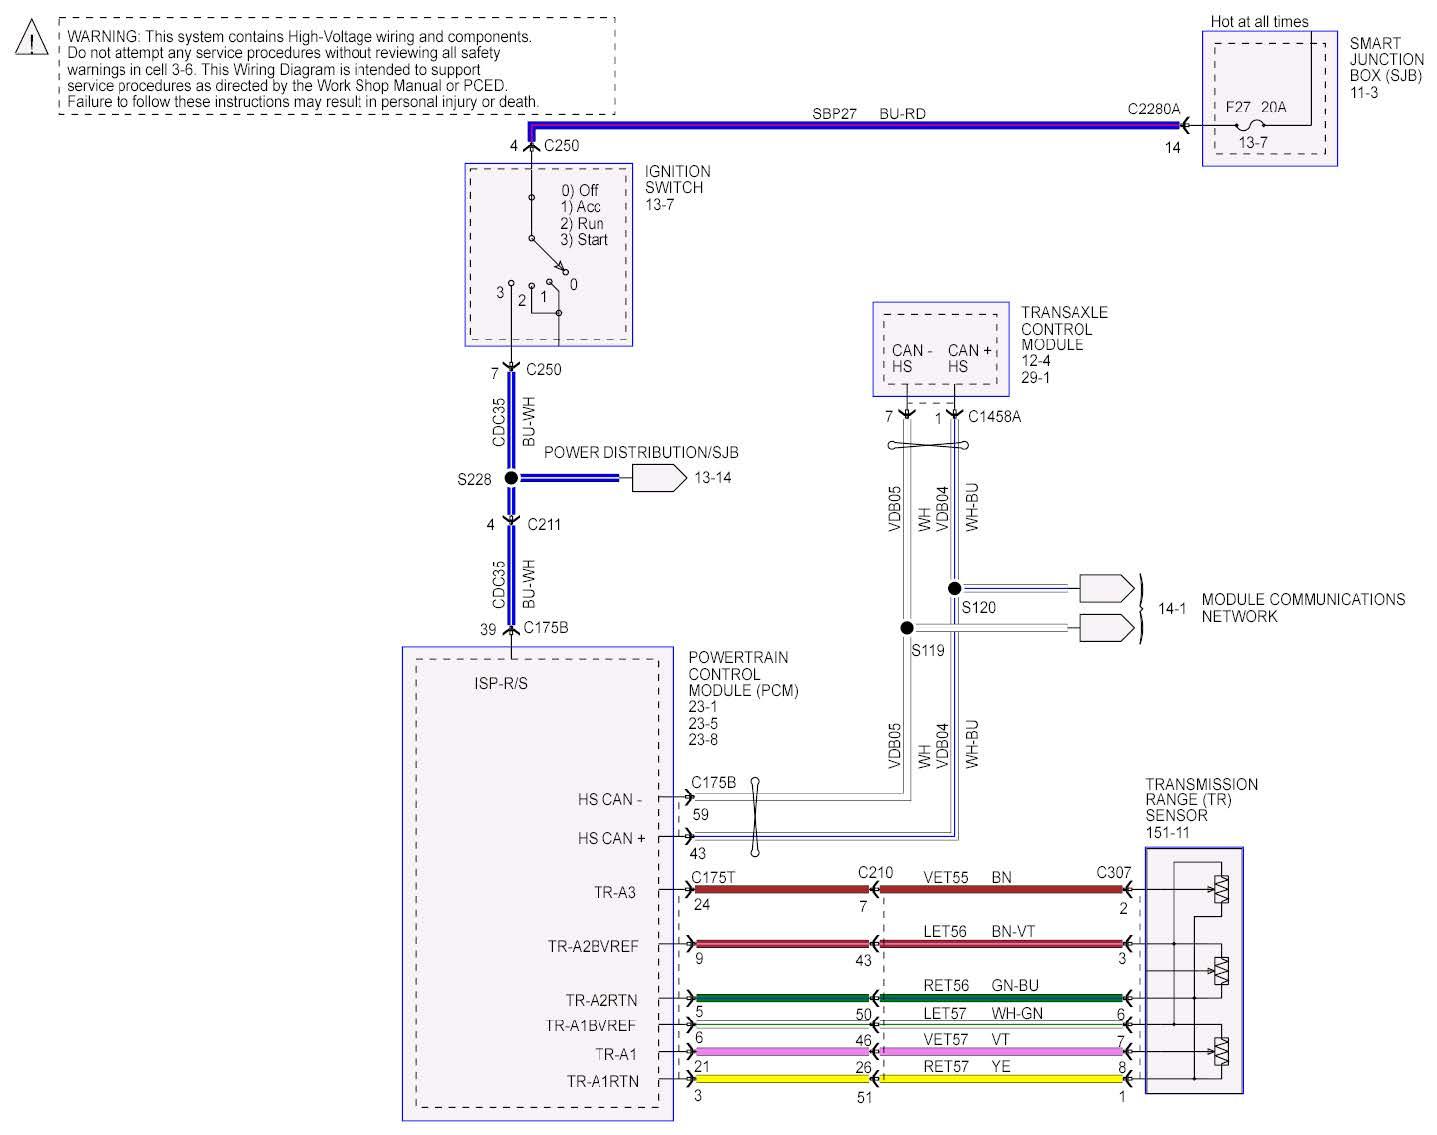 2009 Ford Escape Trailer Wiring Diagram